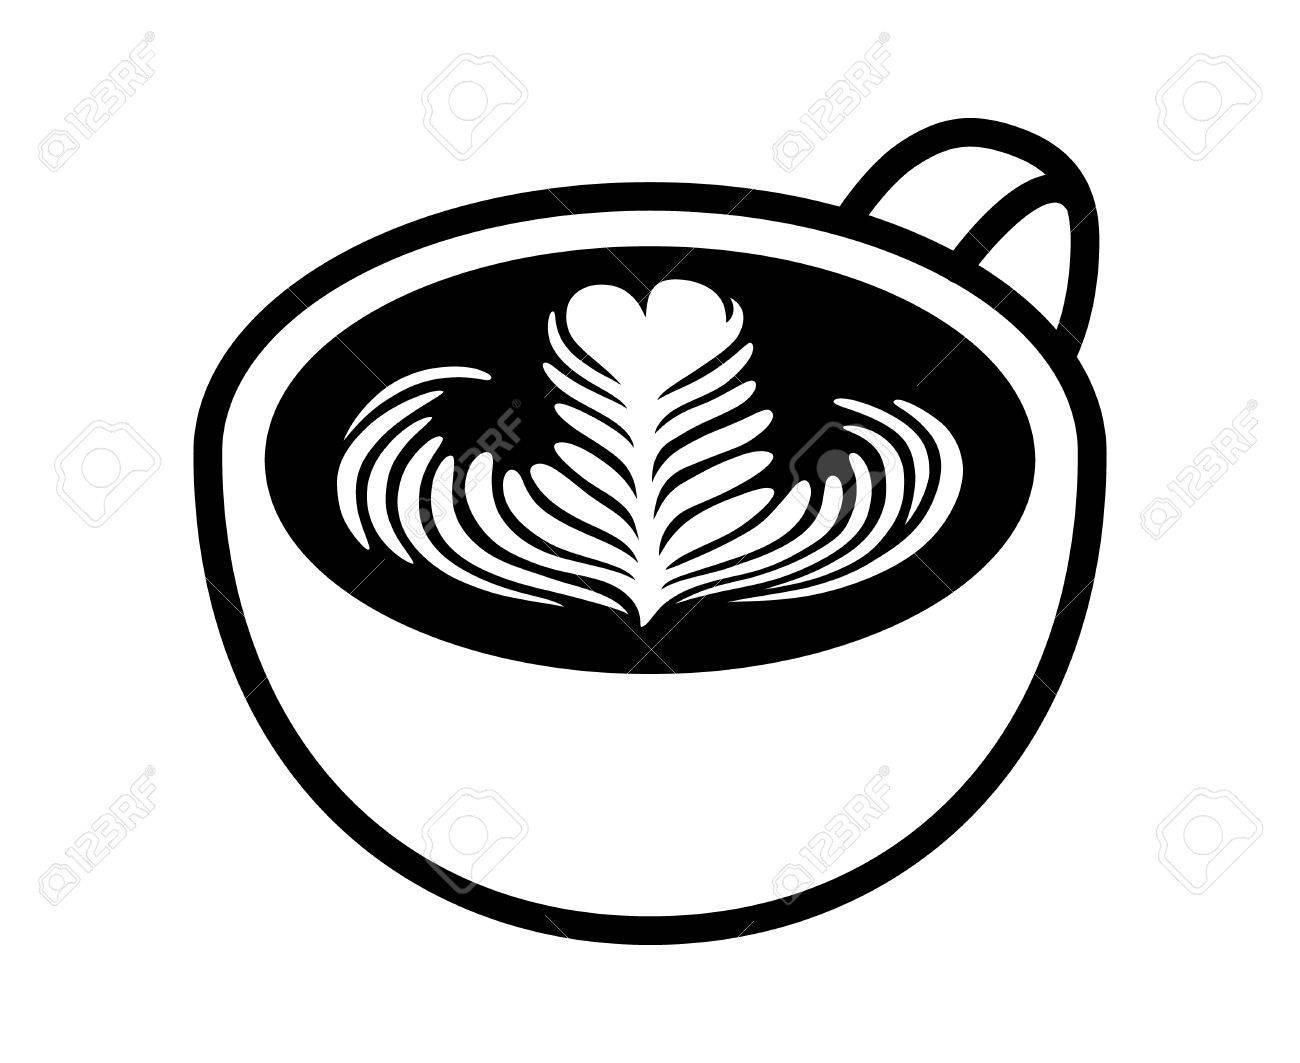 1300x1063 Cup Of Latte Espresso Art With Rosette Leaf Line Art Vector